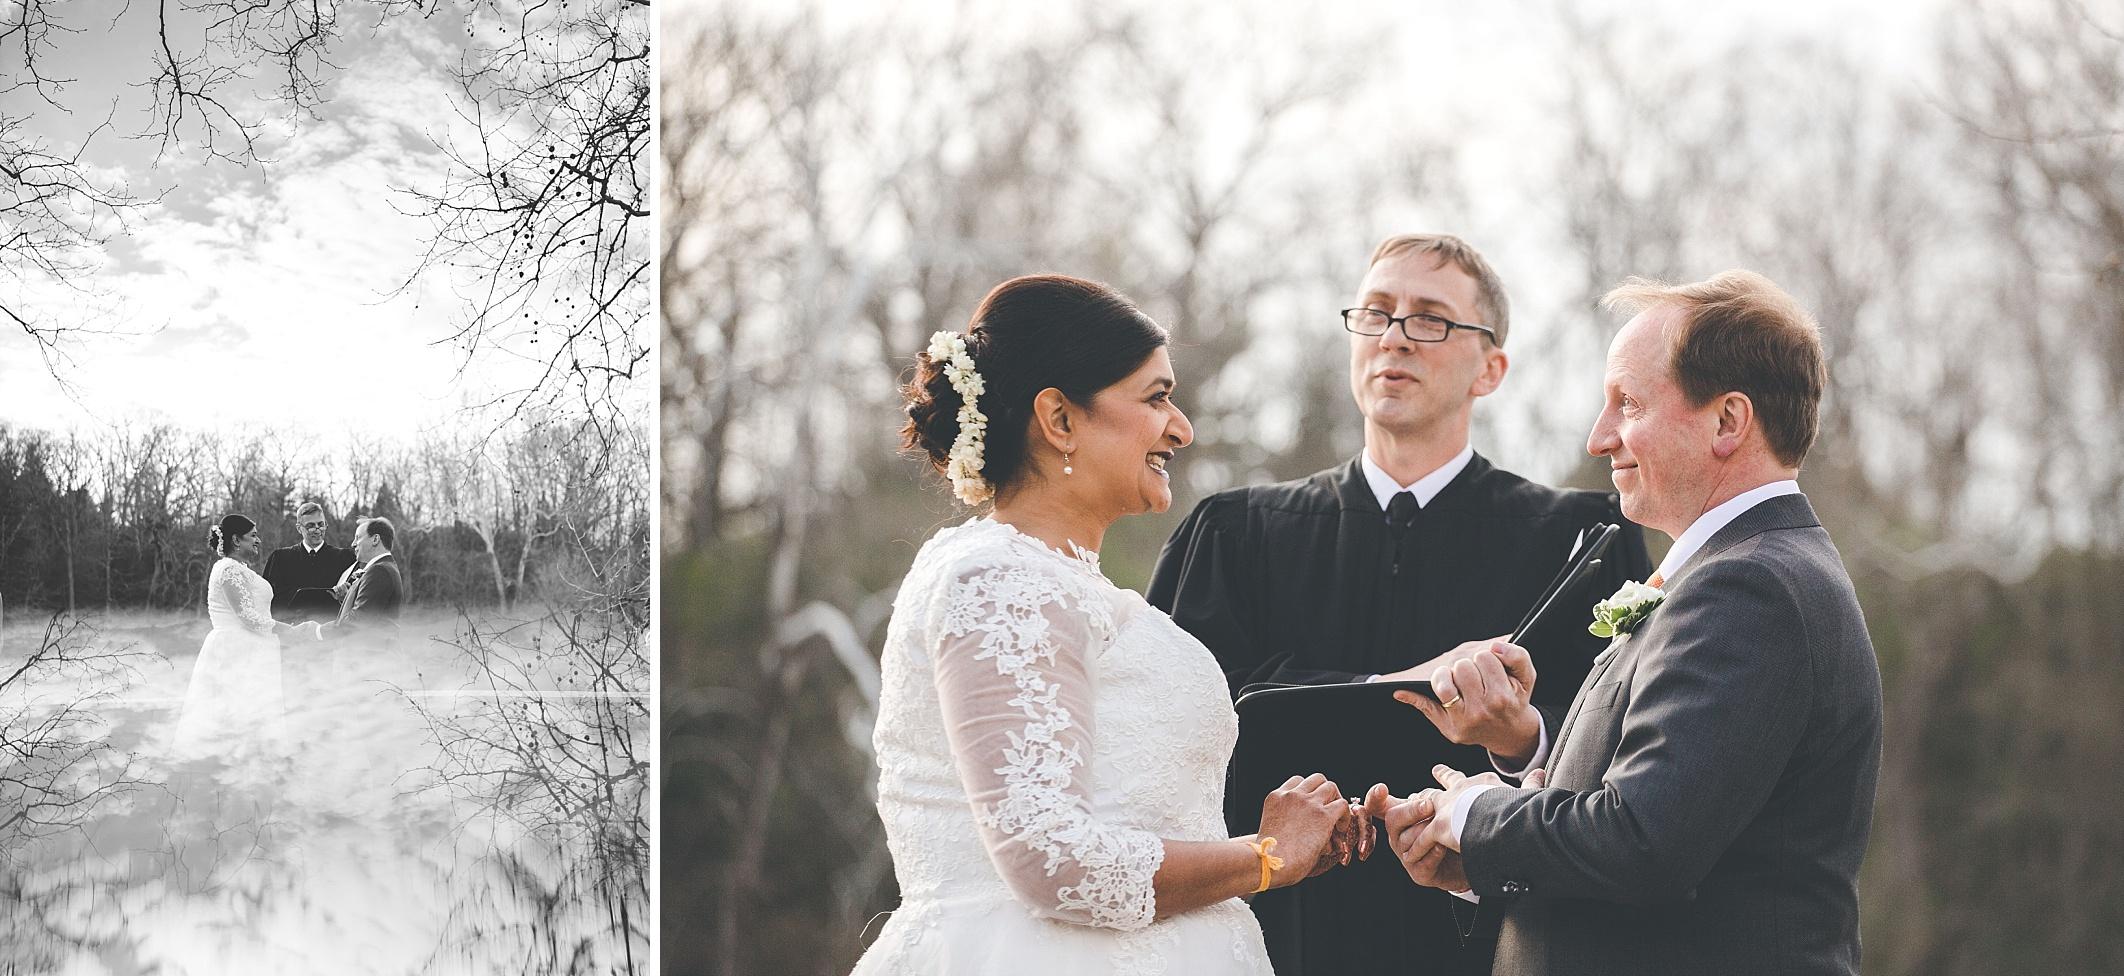 2708_dayton-indian-wedding-photographer-beavercreek_0063.jpg